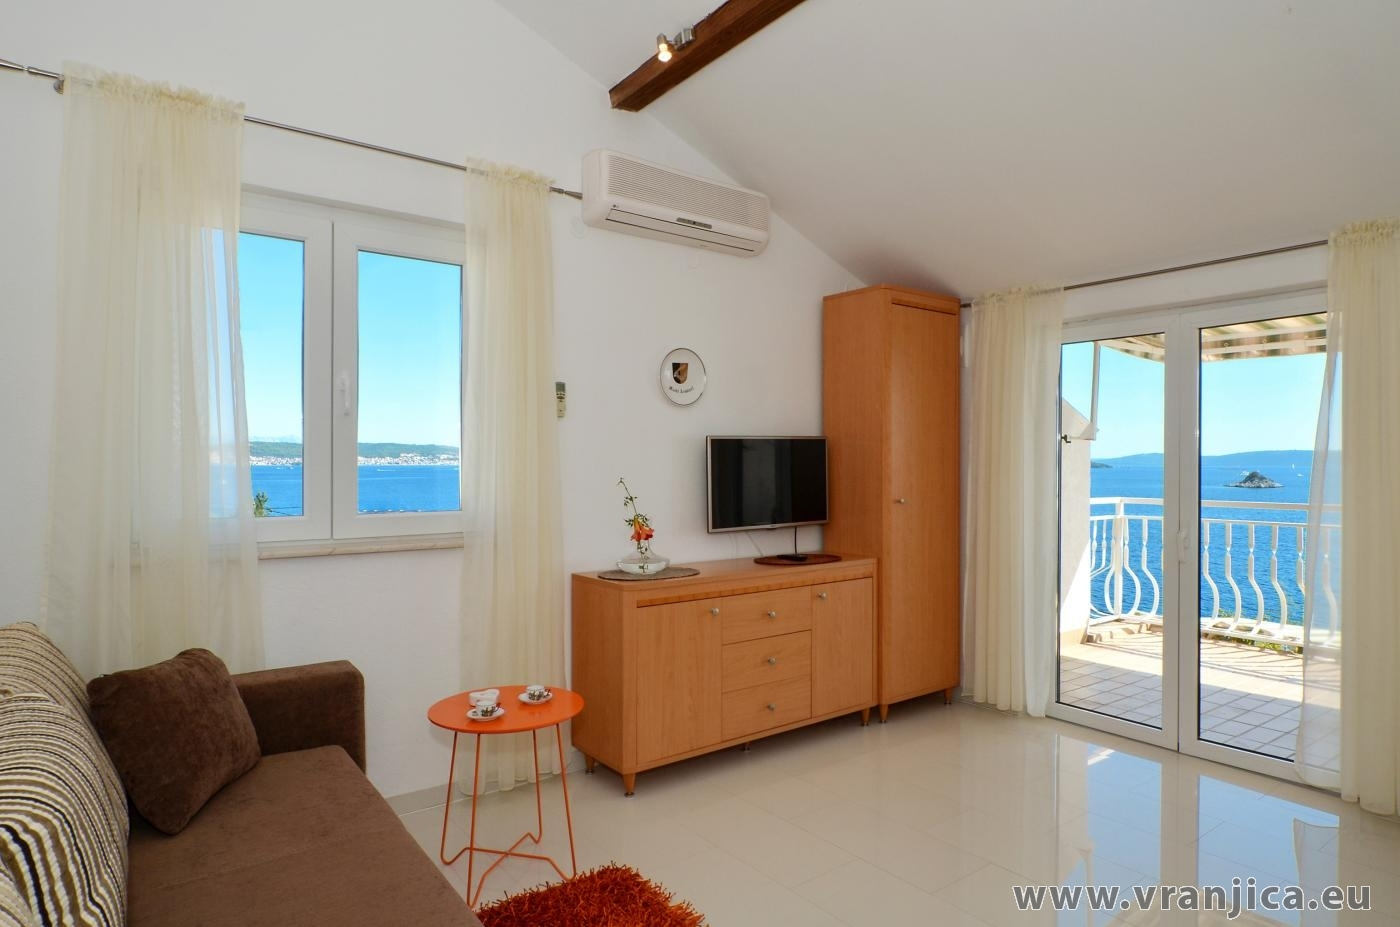 https://www.vranjica.eu/pokoje/apartman-inge-ap1-2-2-1572991350L.jpg